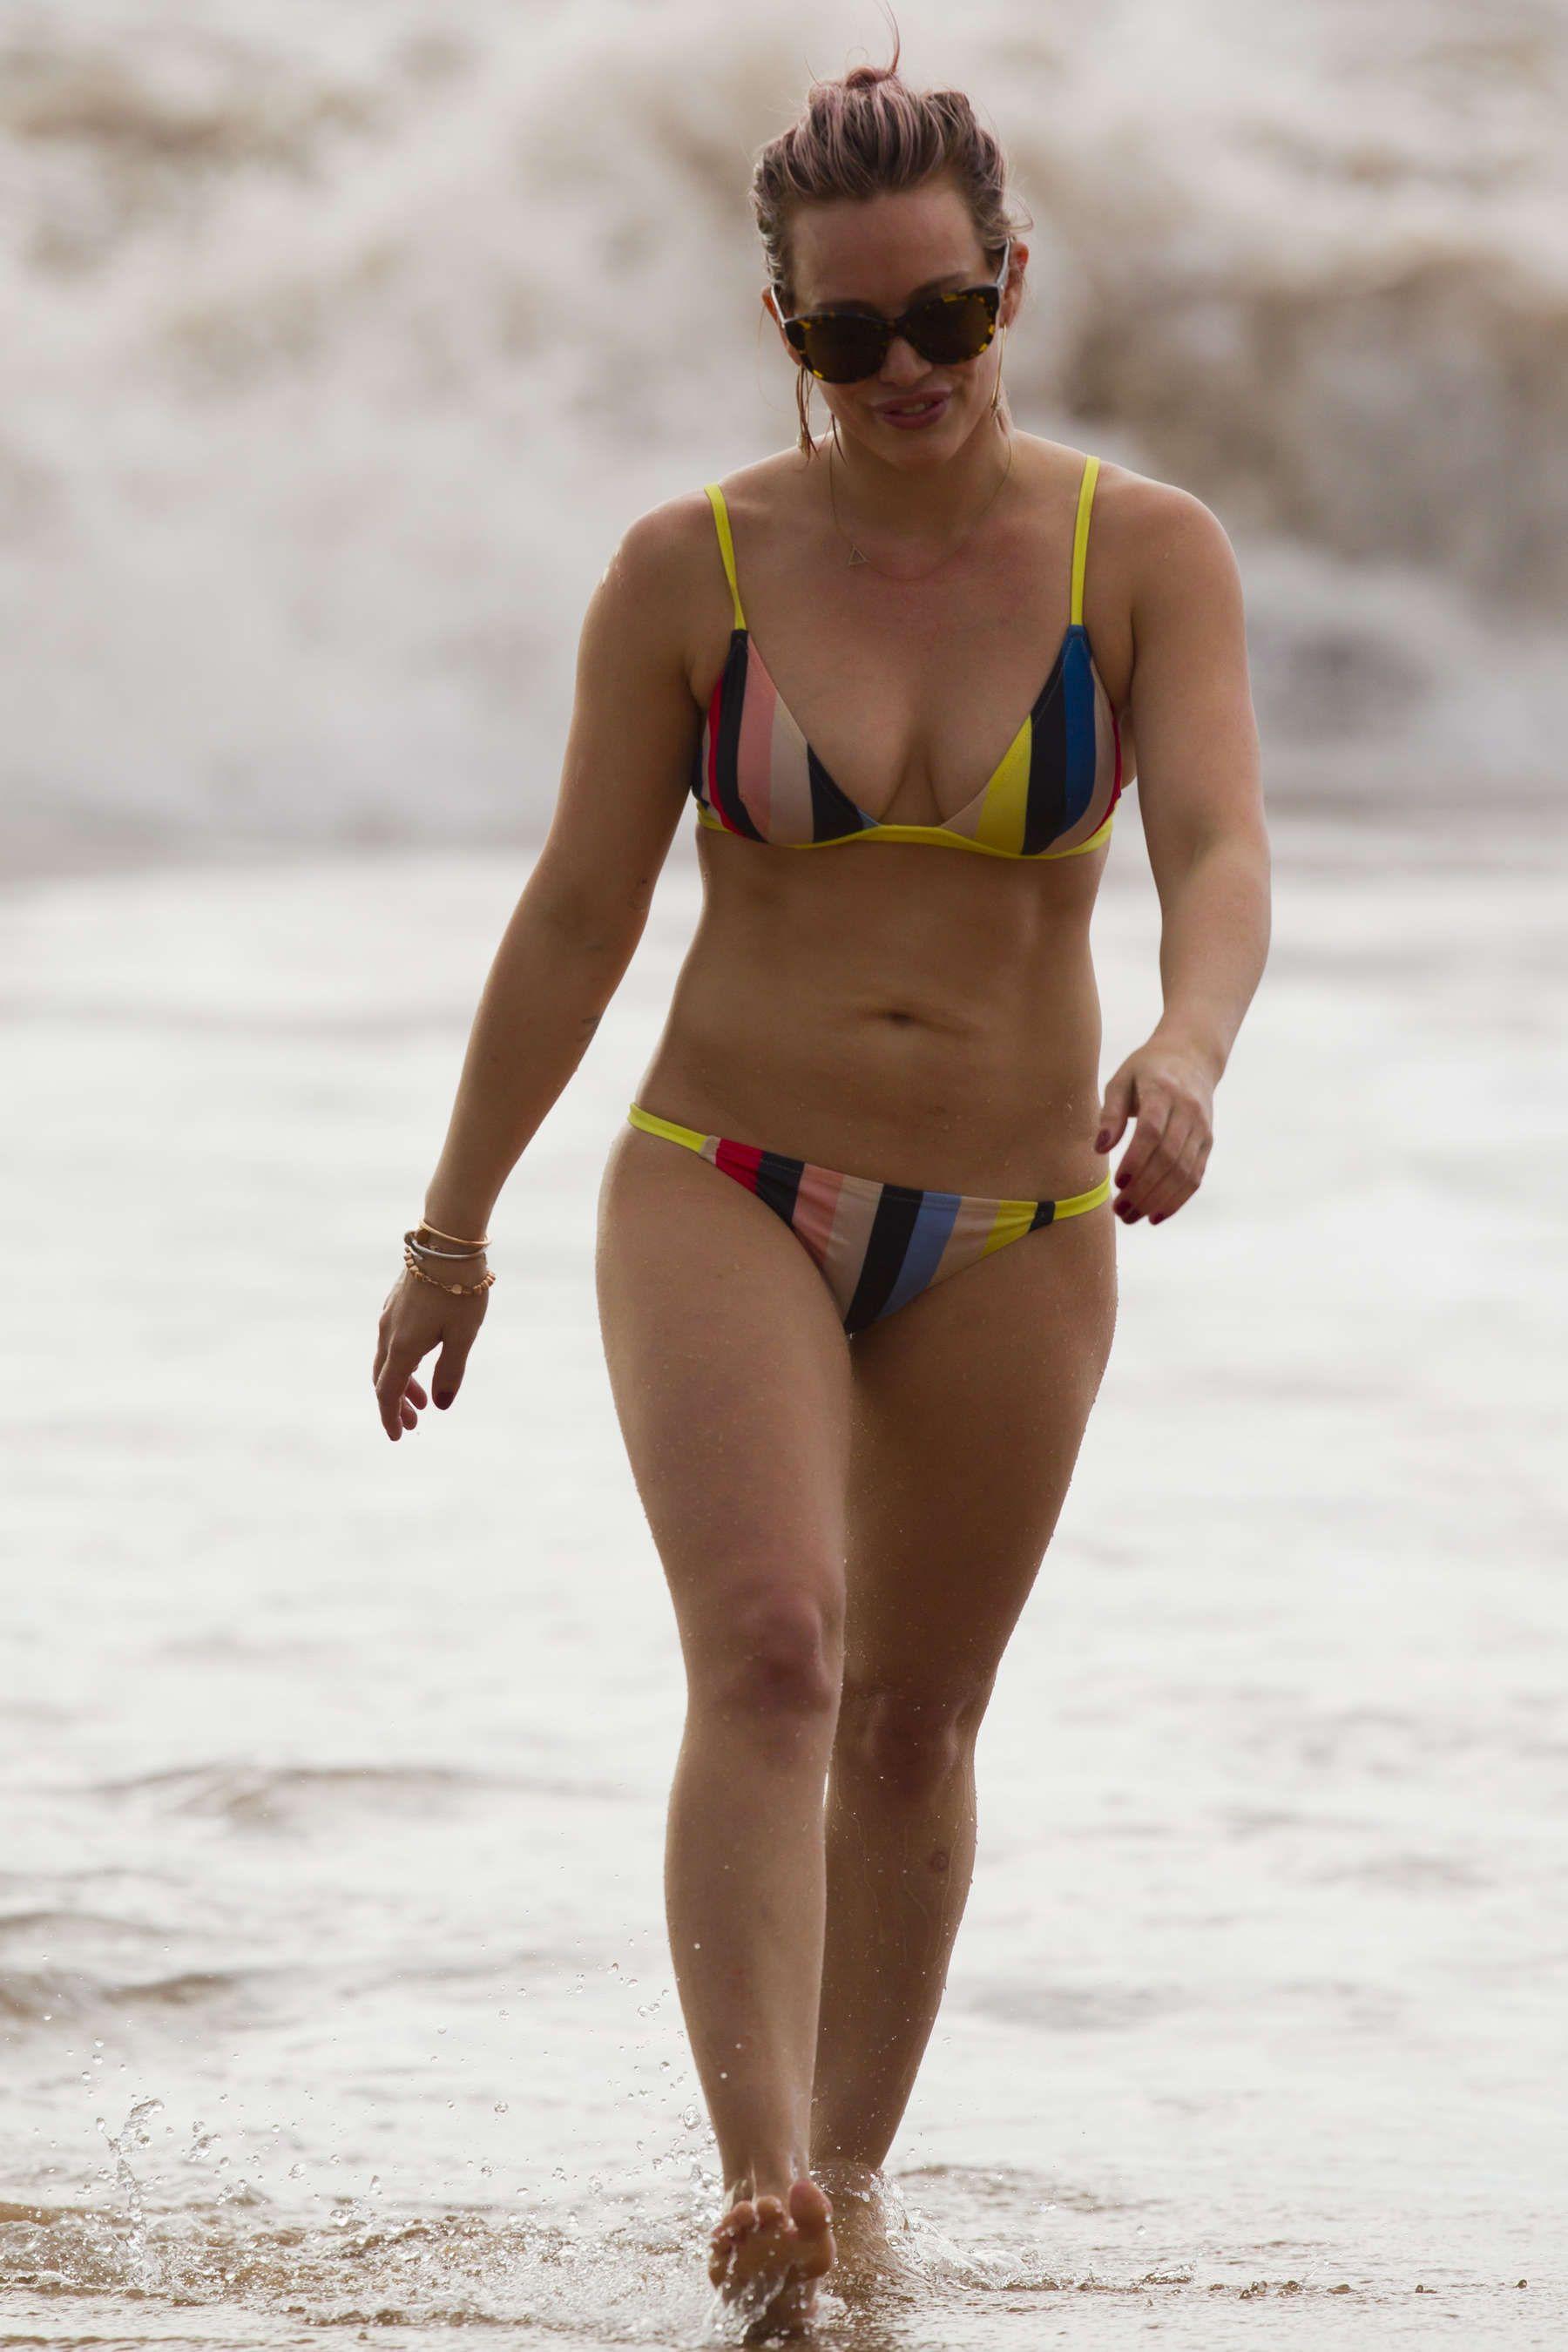 Imágenes desnudas duff Hilary